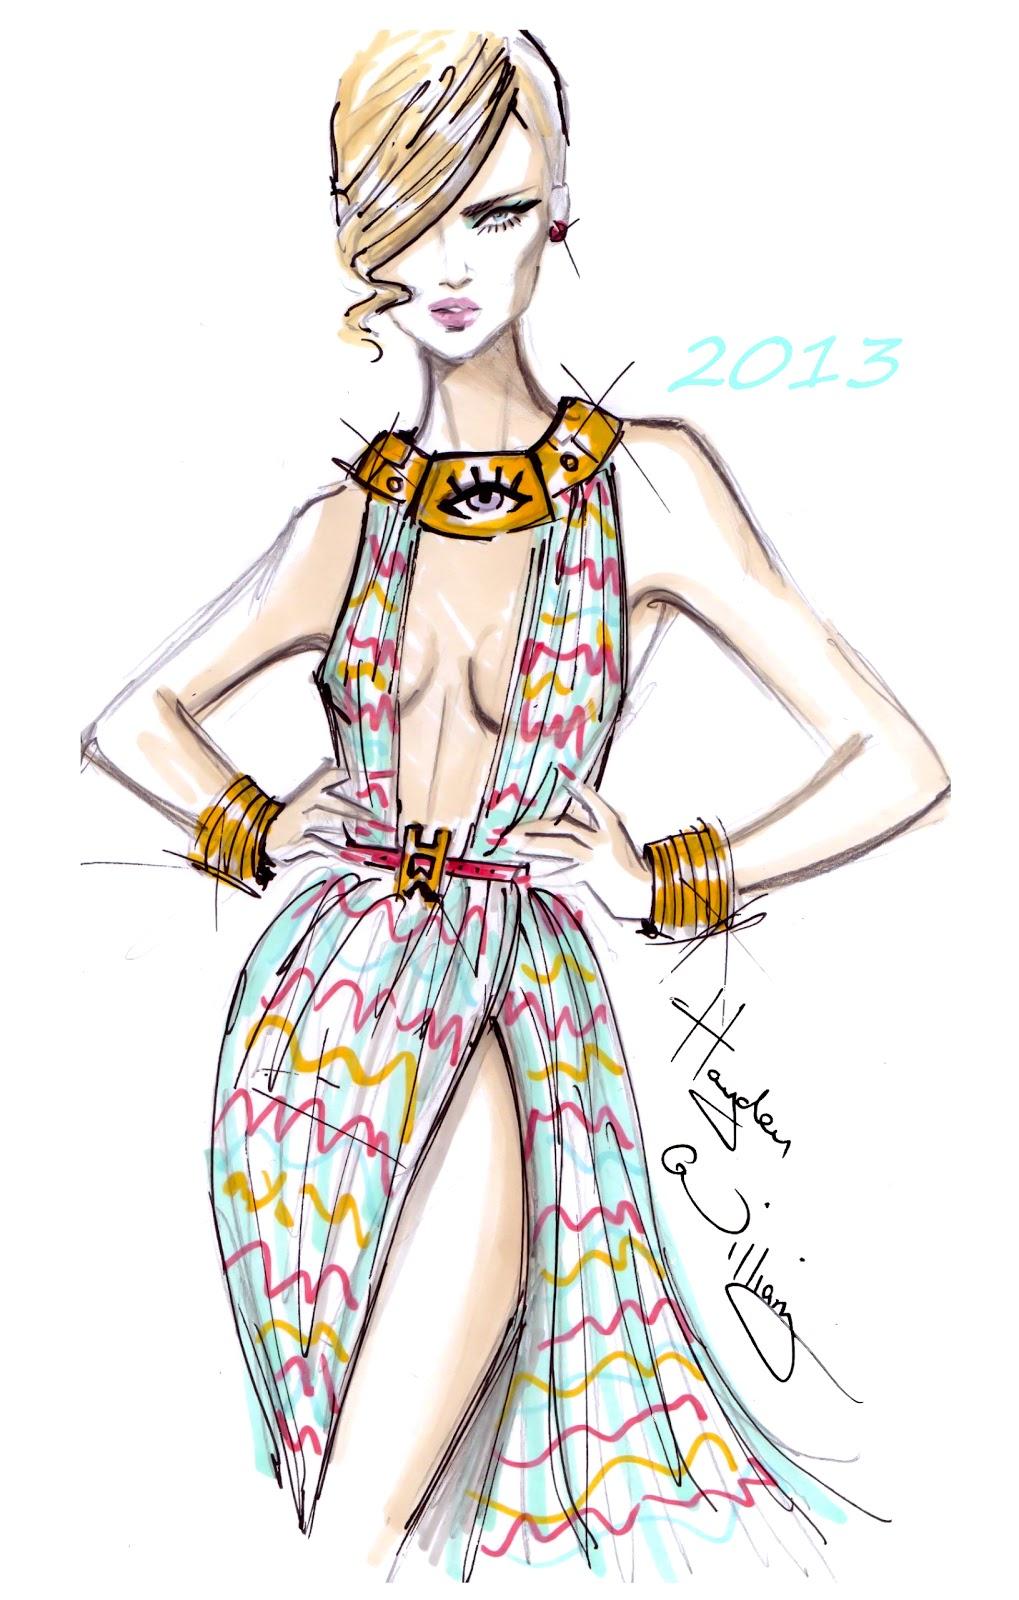 Fashion Illustration Royalty Free Stock Photo: Hayden Williams Fashion Illustrations: January 2013